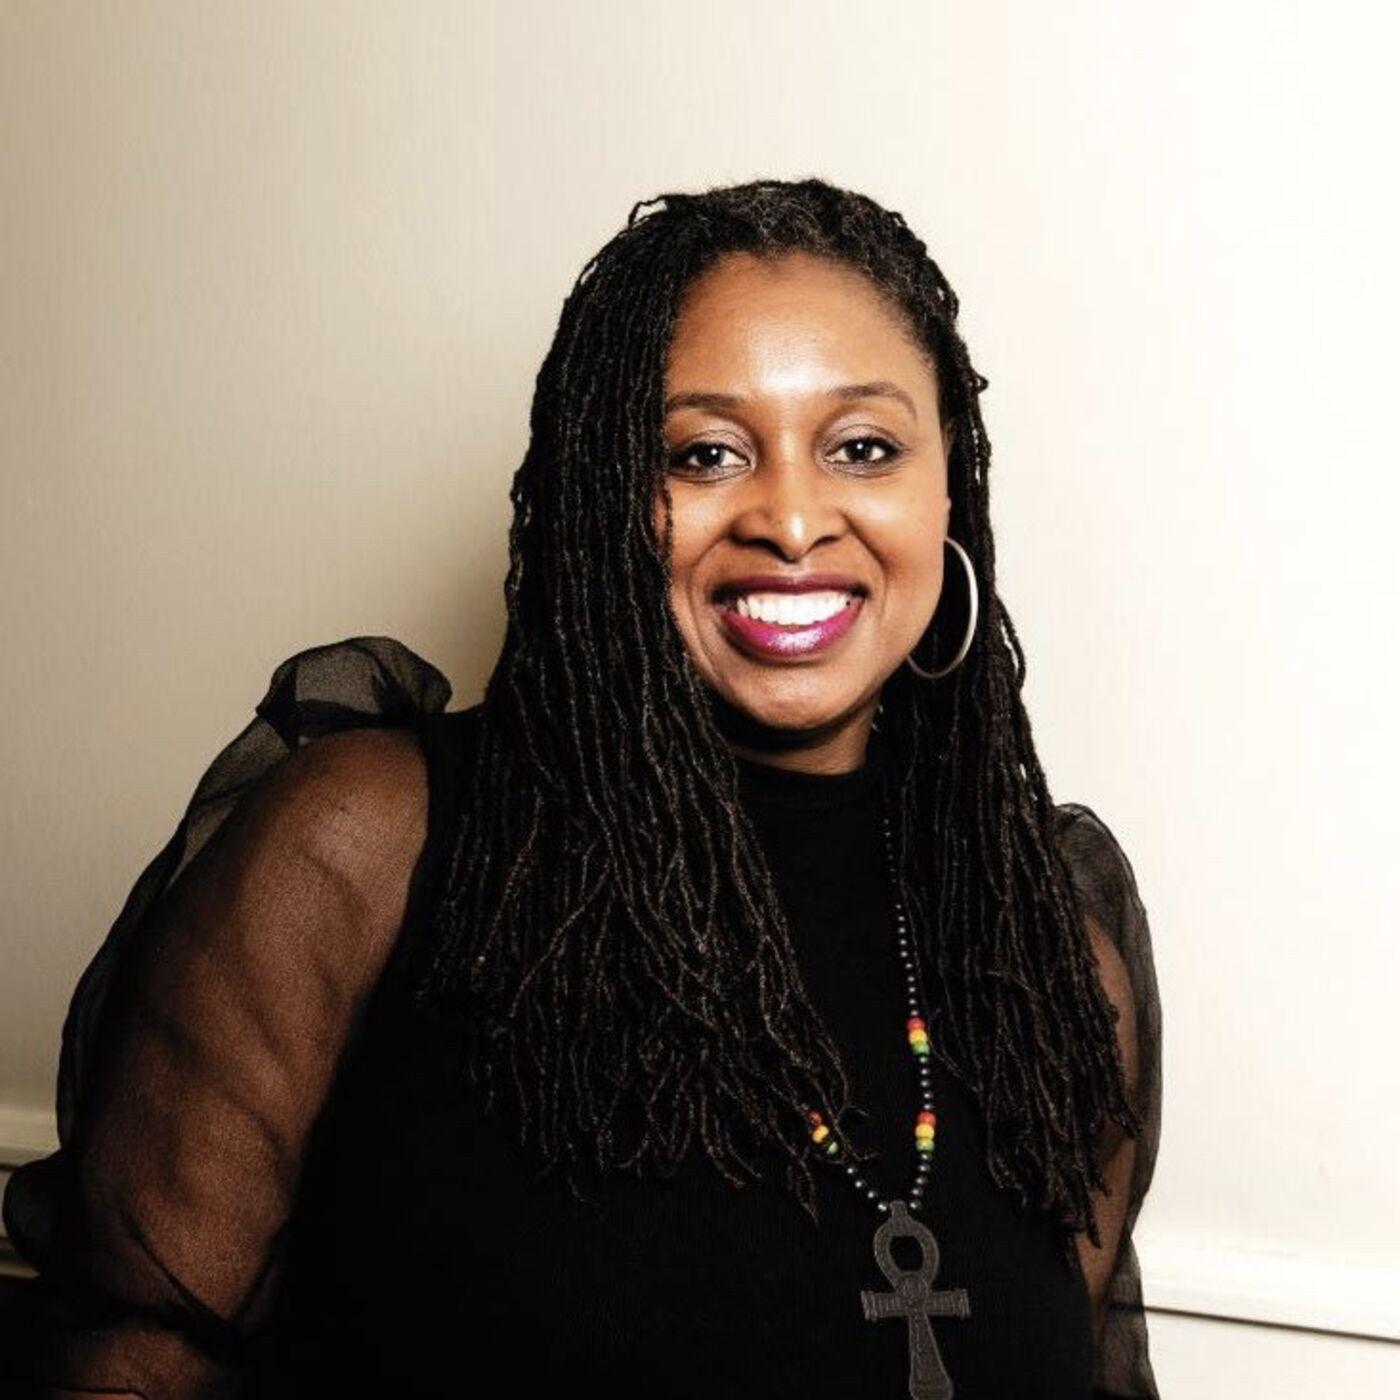 Politician Dawn Butler - Racism, vulnerability and politics